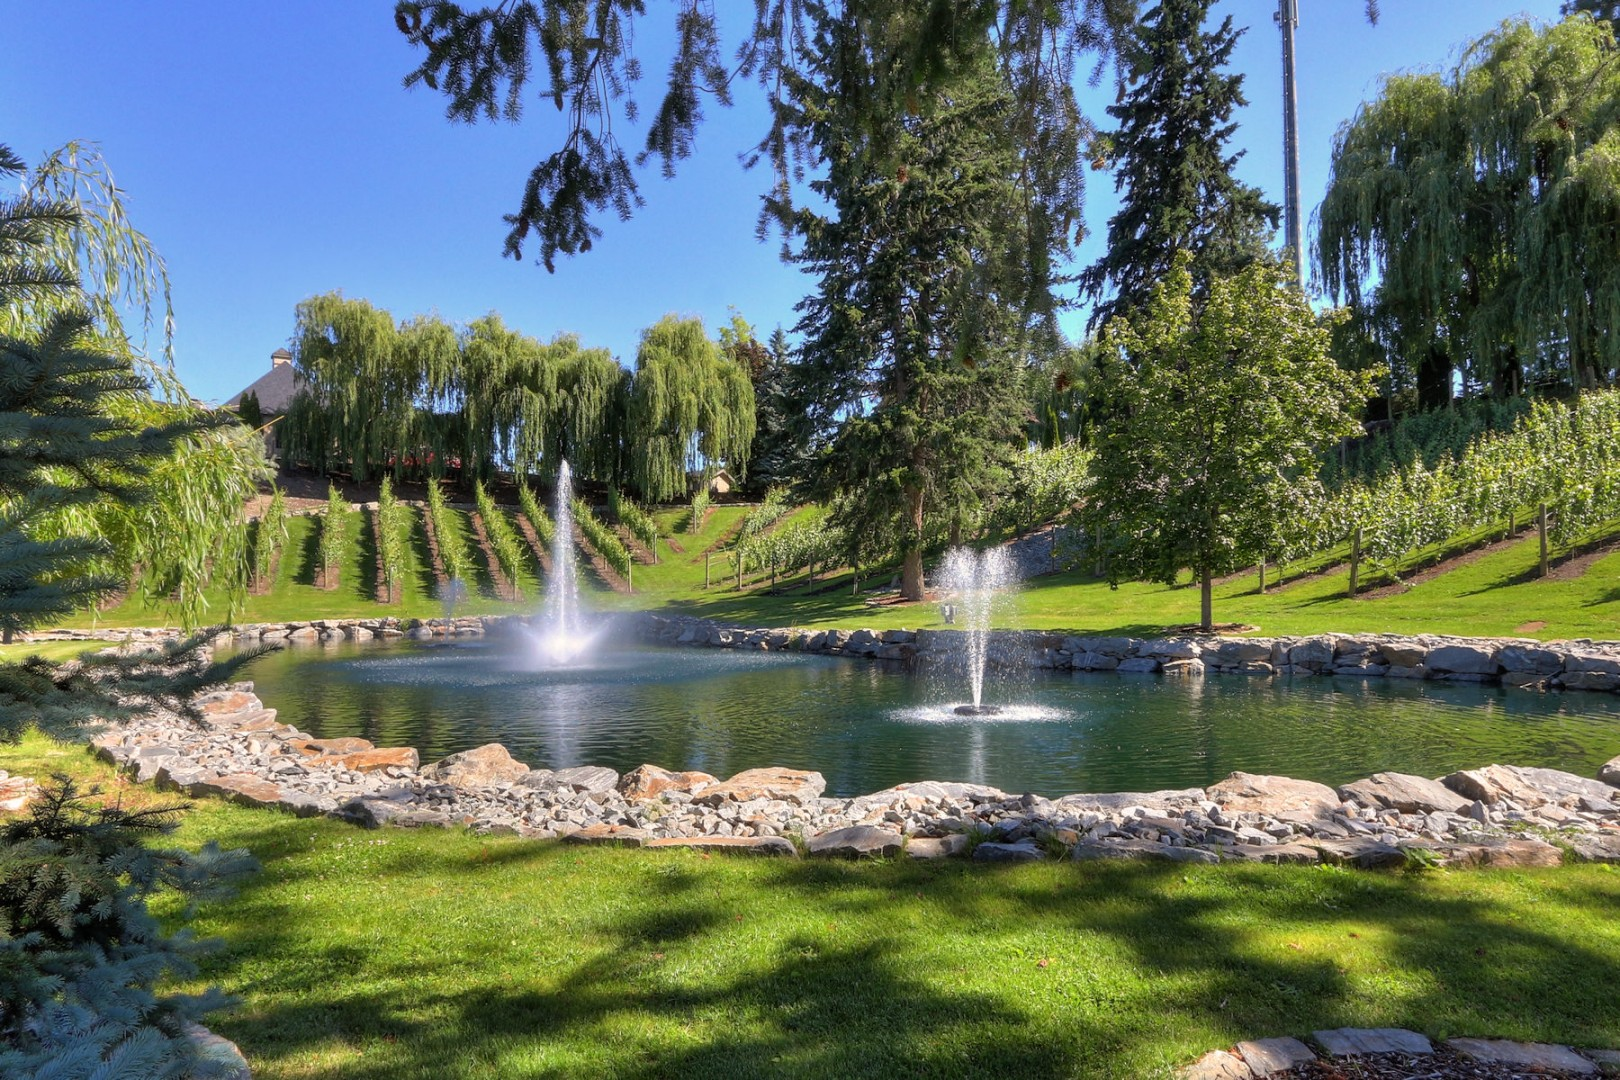 Vancouver To Okanagan Valley Property Of Okanagan Nation